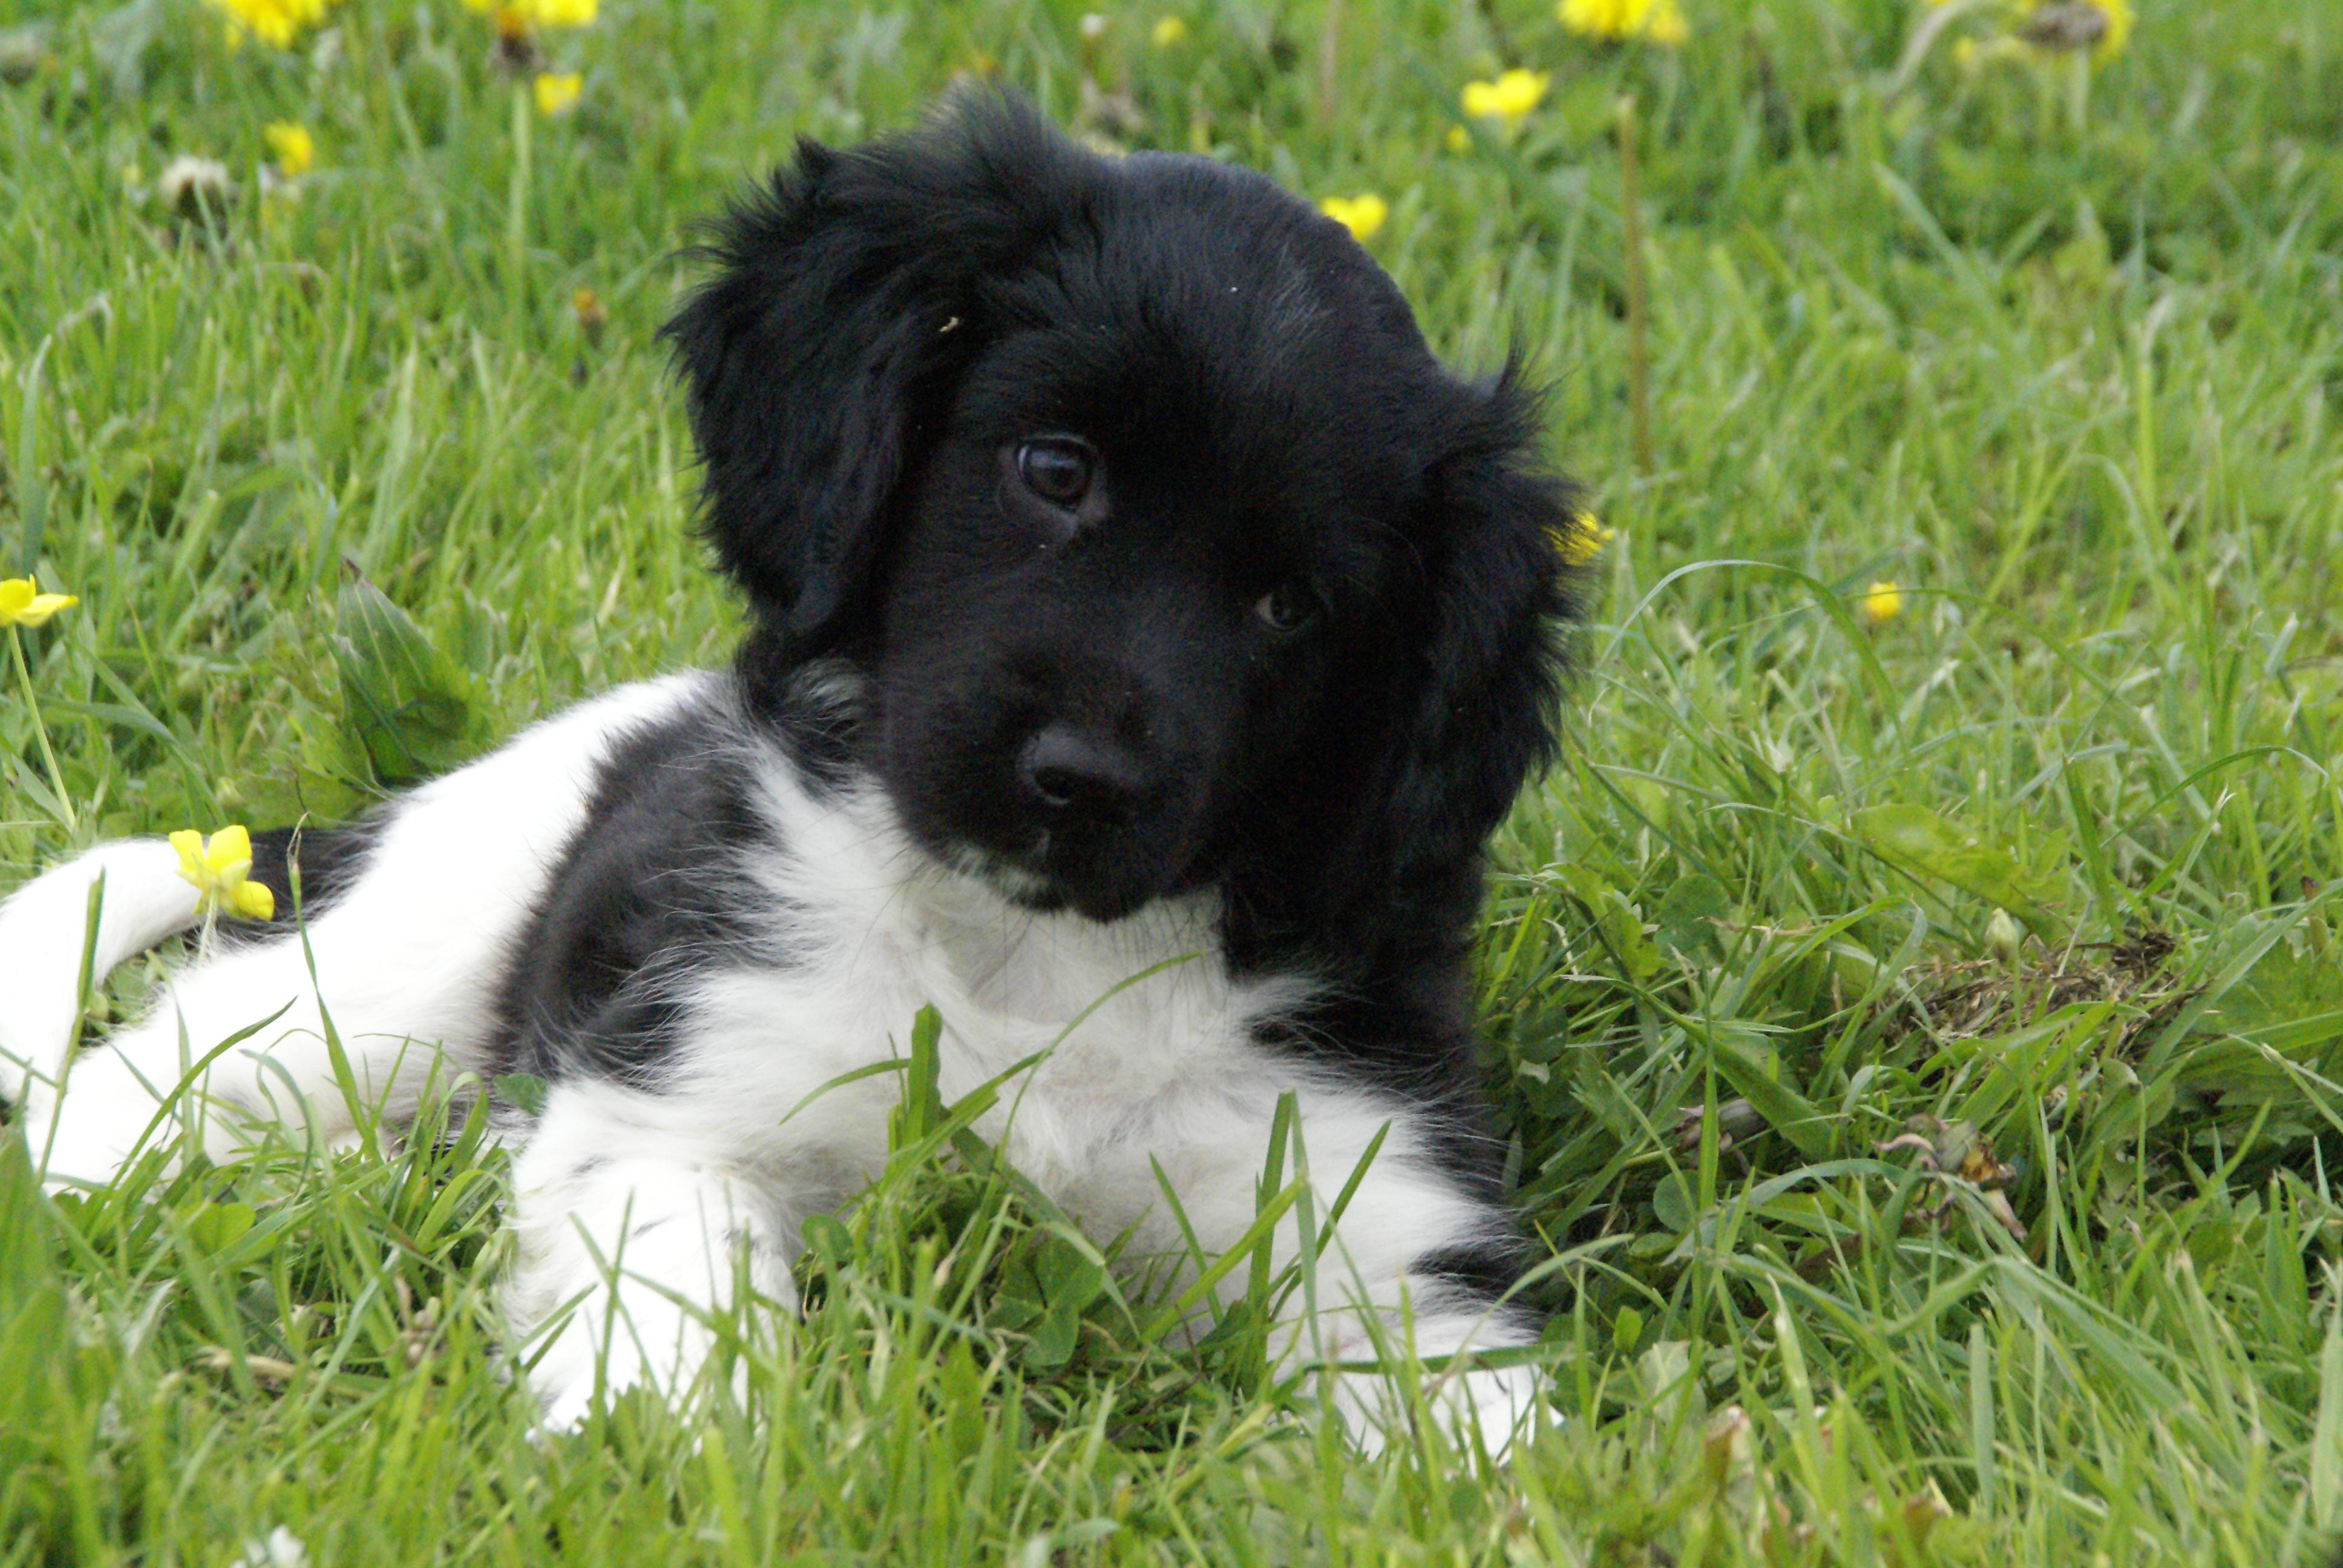 Stabyhoun puppy in the grass wallpaper